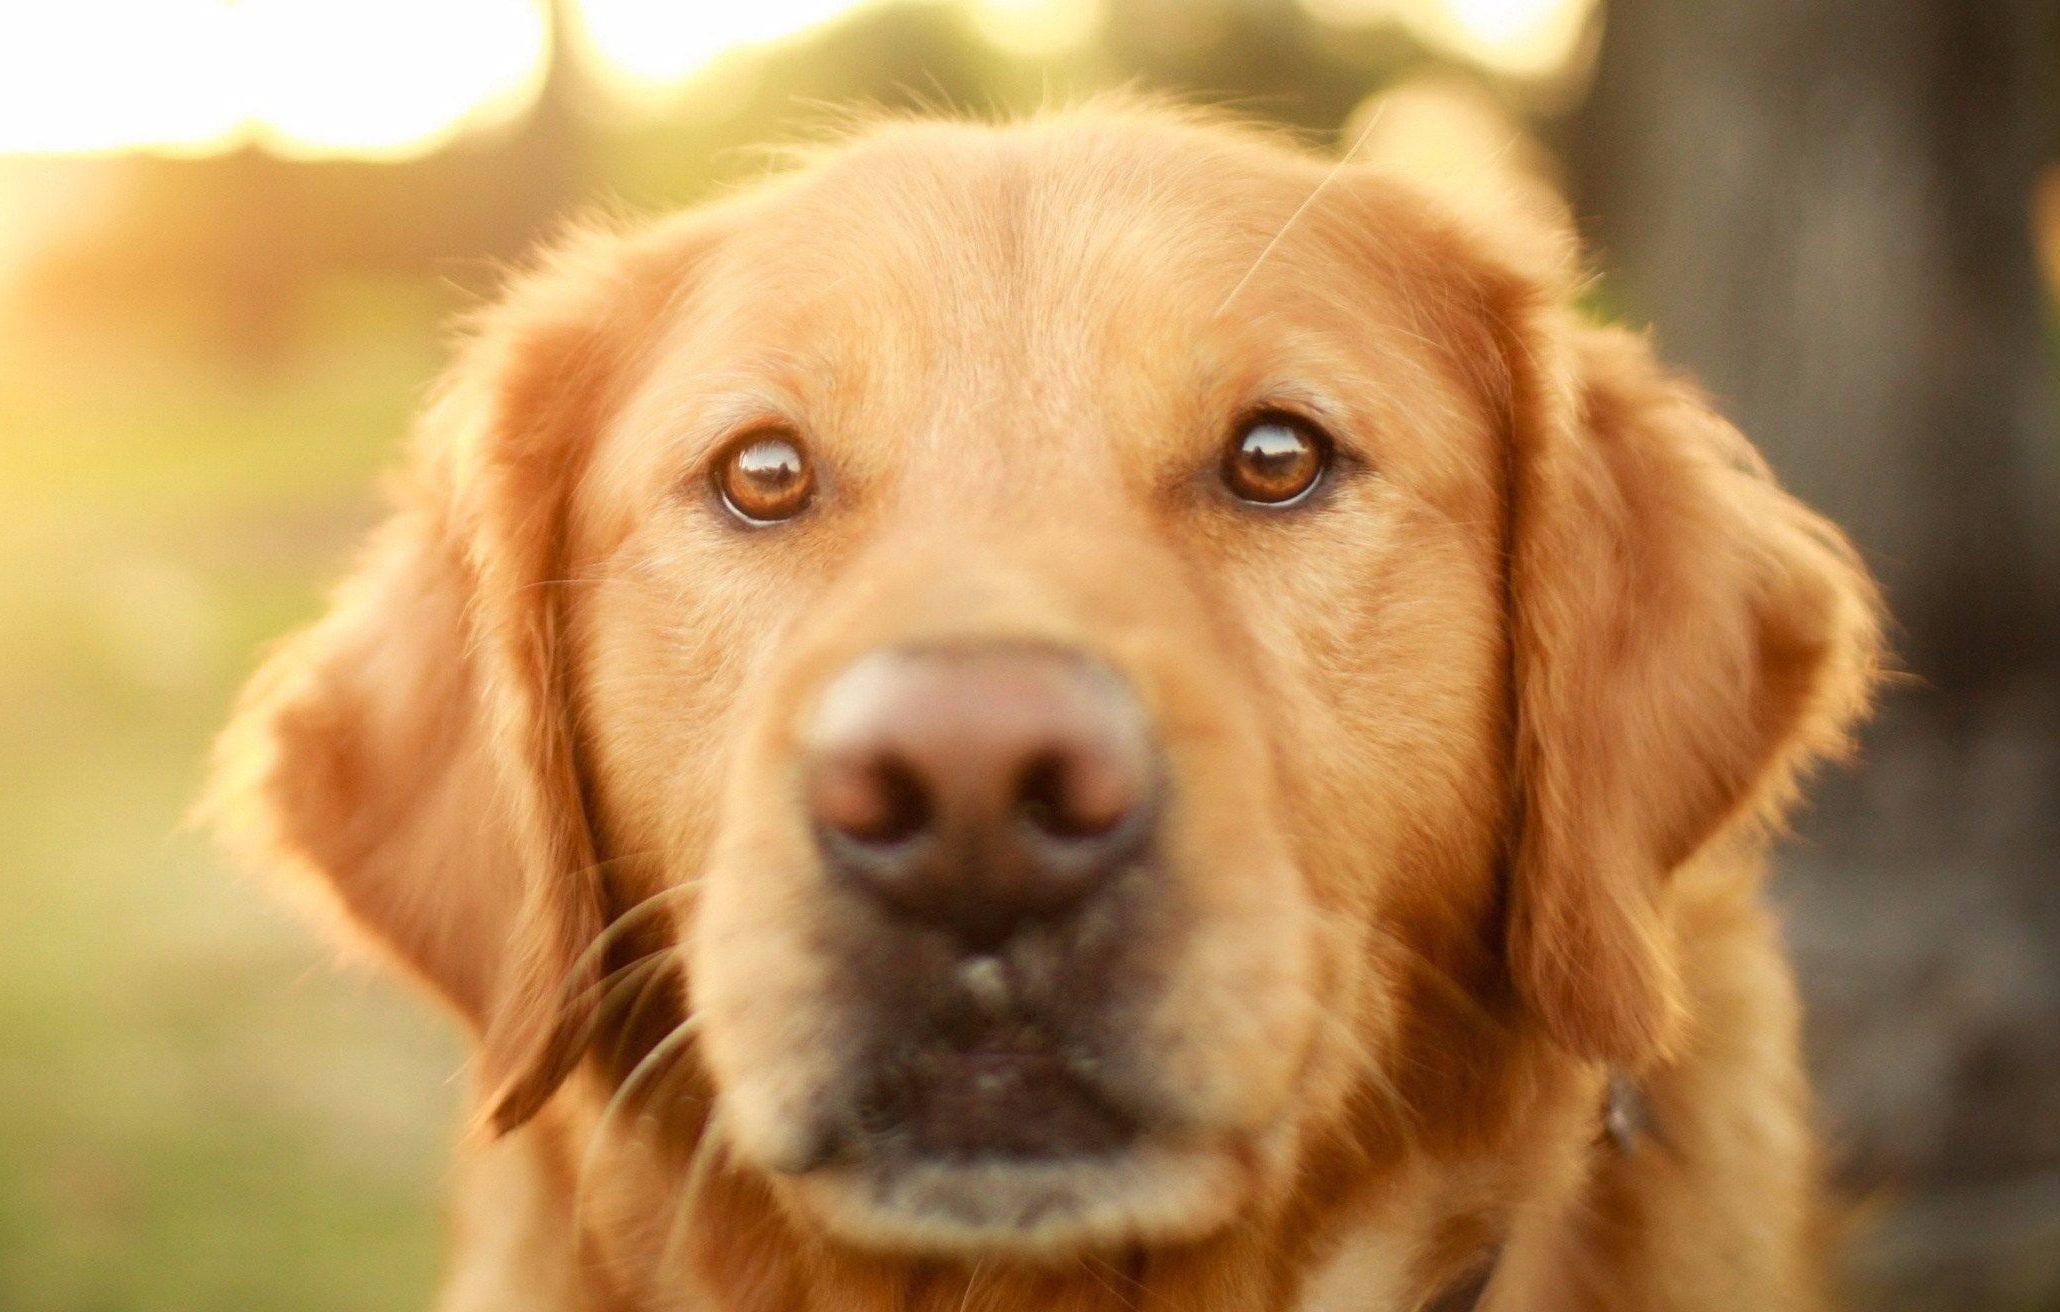 6965572-sunlight-dog-compressed